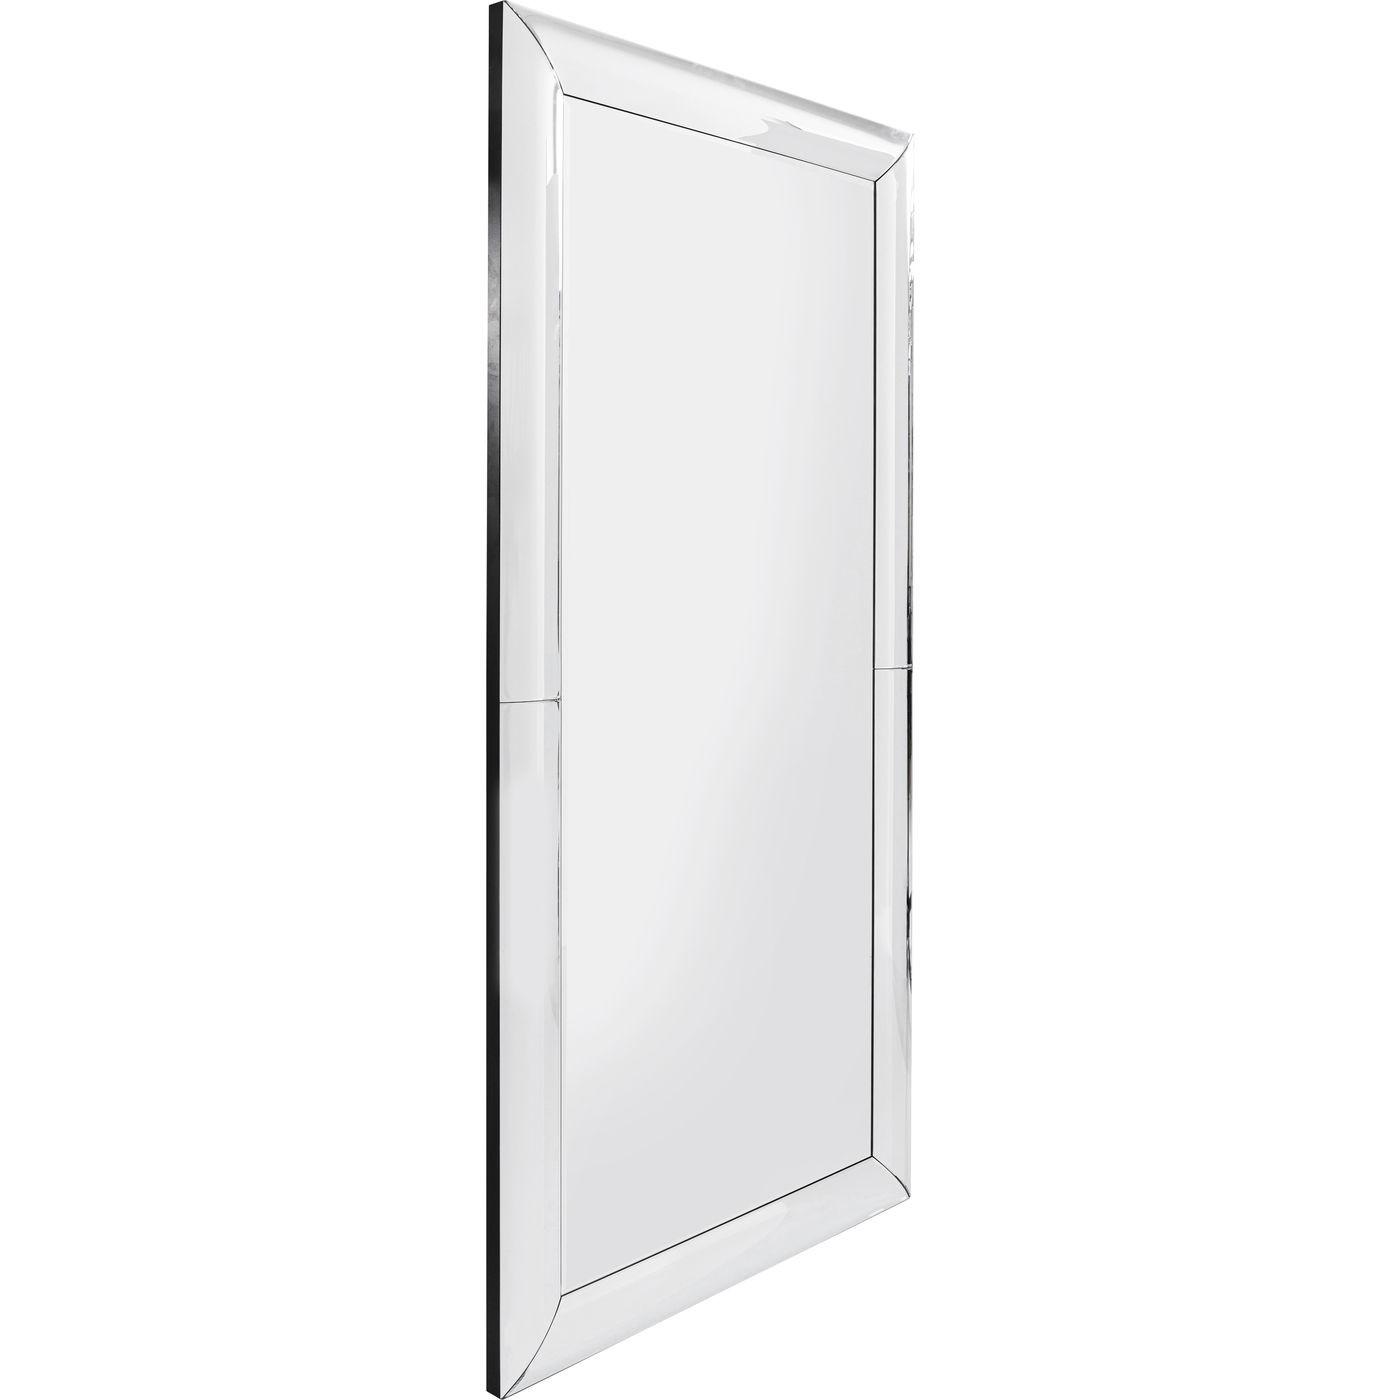 Miroir Bounce rectangulaire 207x99cm Kare Design